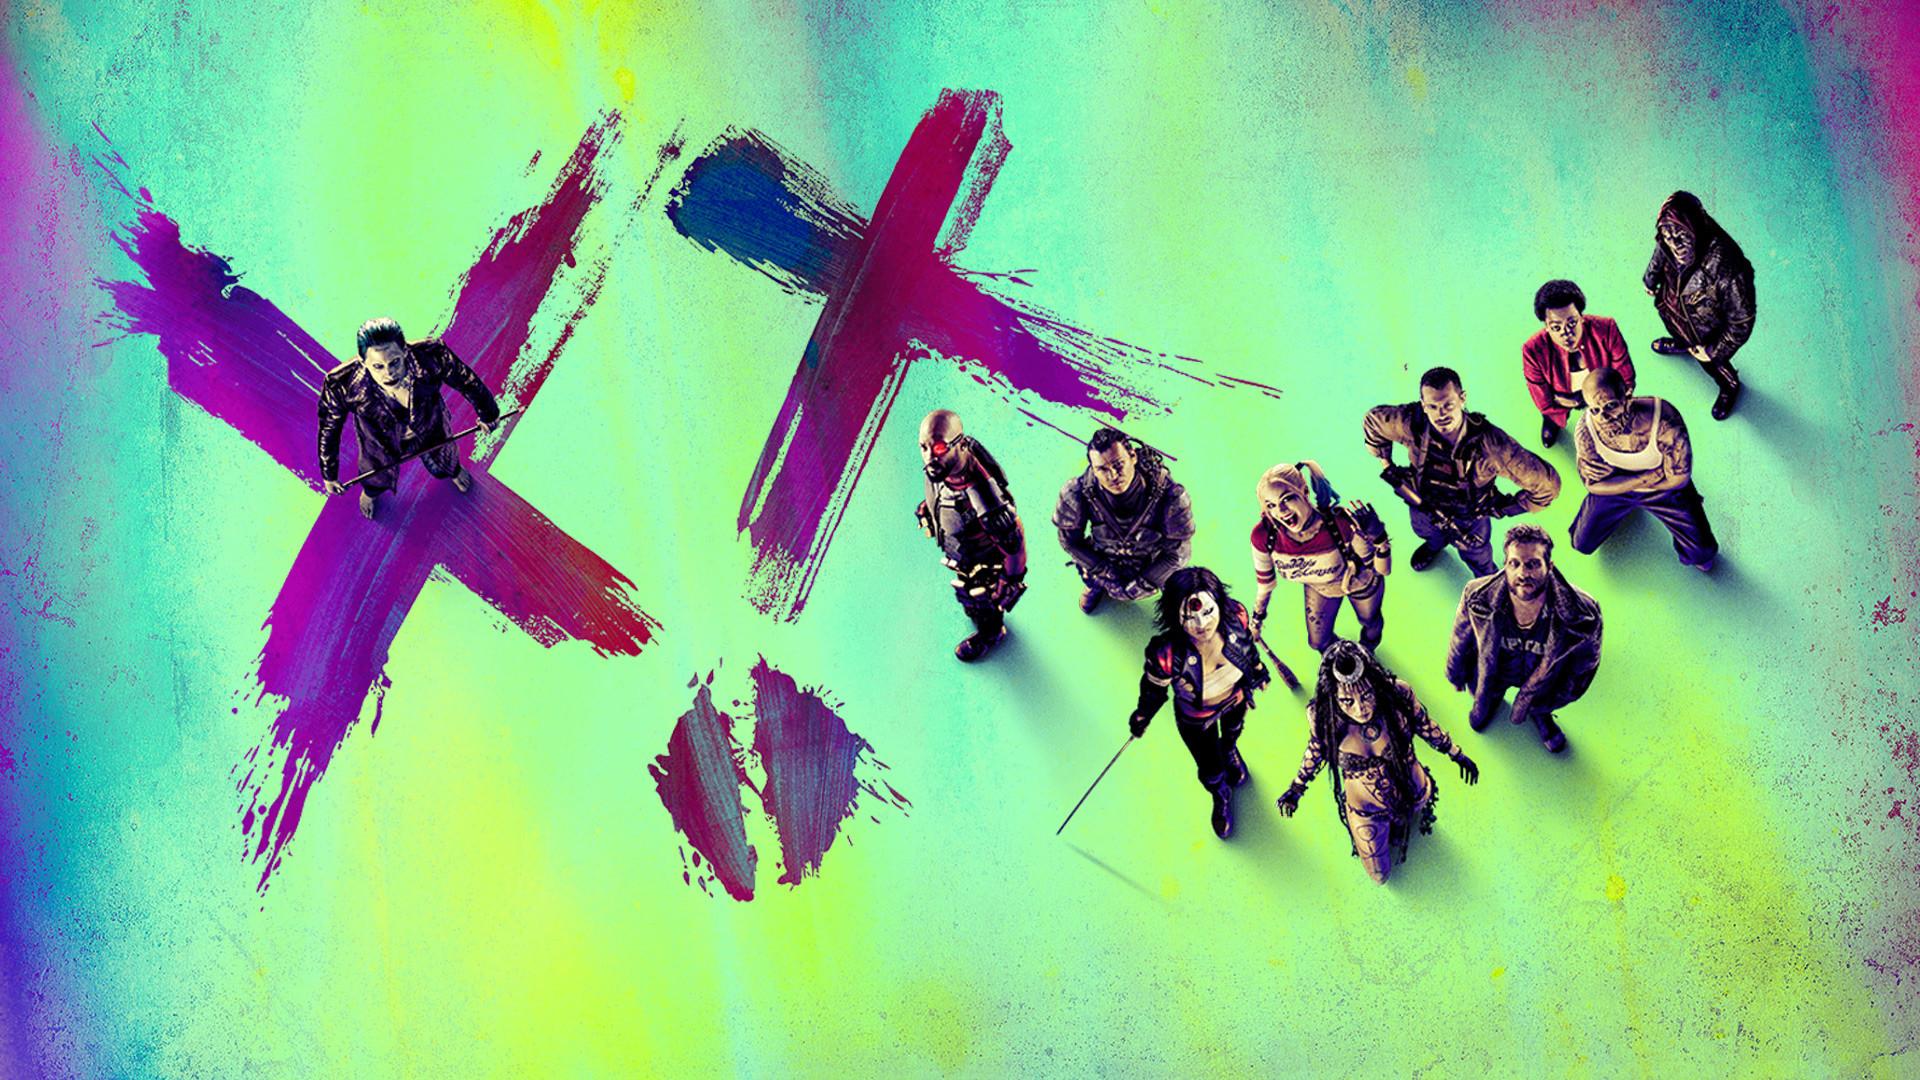 Suicide Squad Full HD Wallpaper